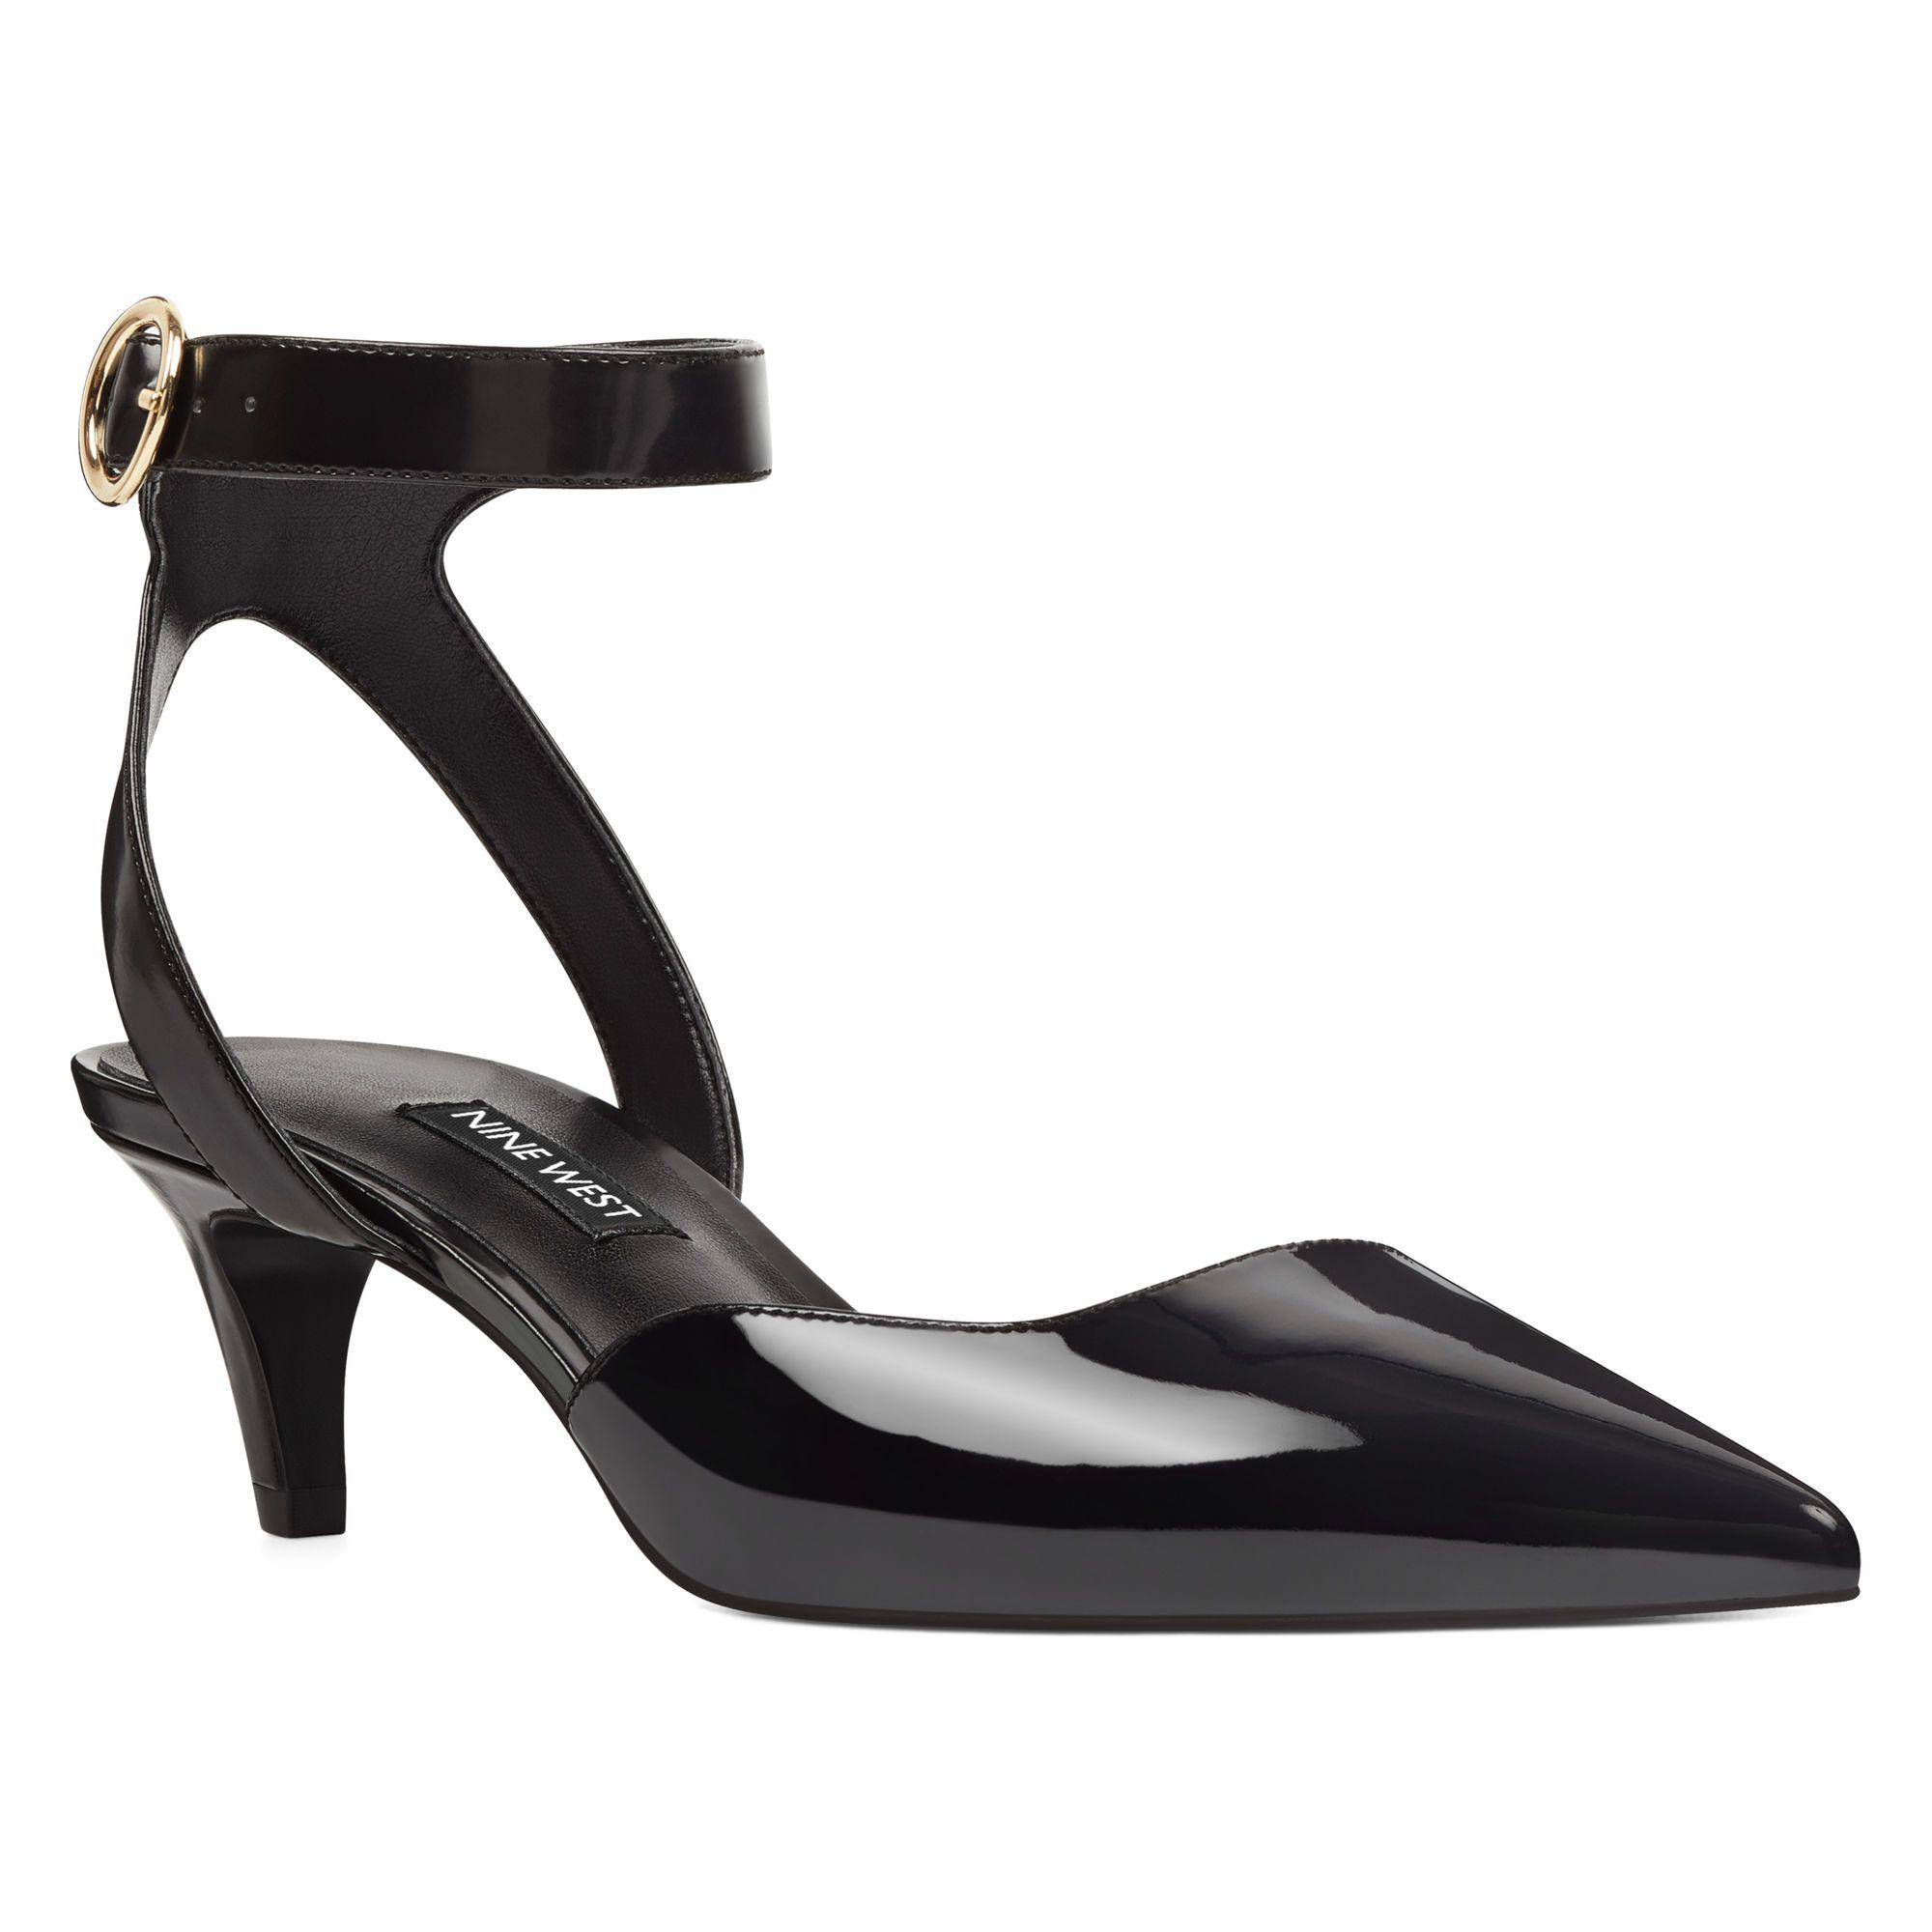 4b04d361399 Quinteena Ankle Strap Pumps   Heels wish list   Ankle strap, Ankle ...